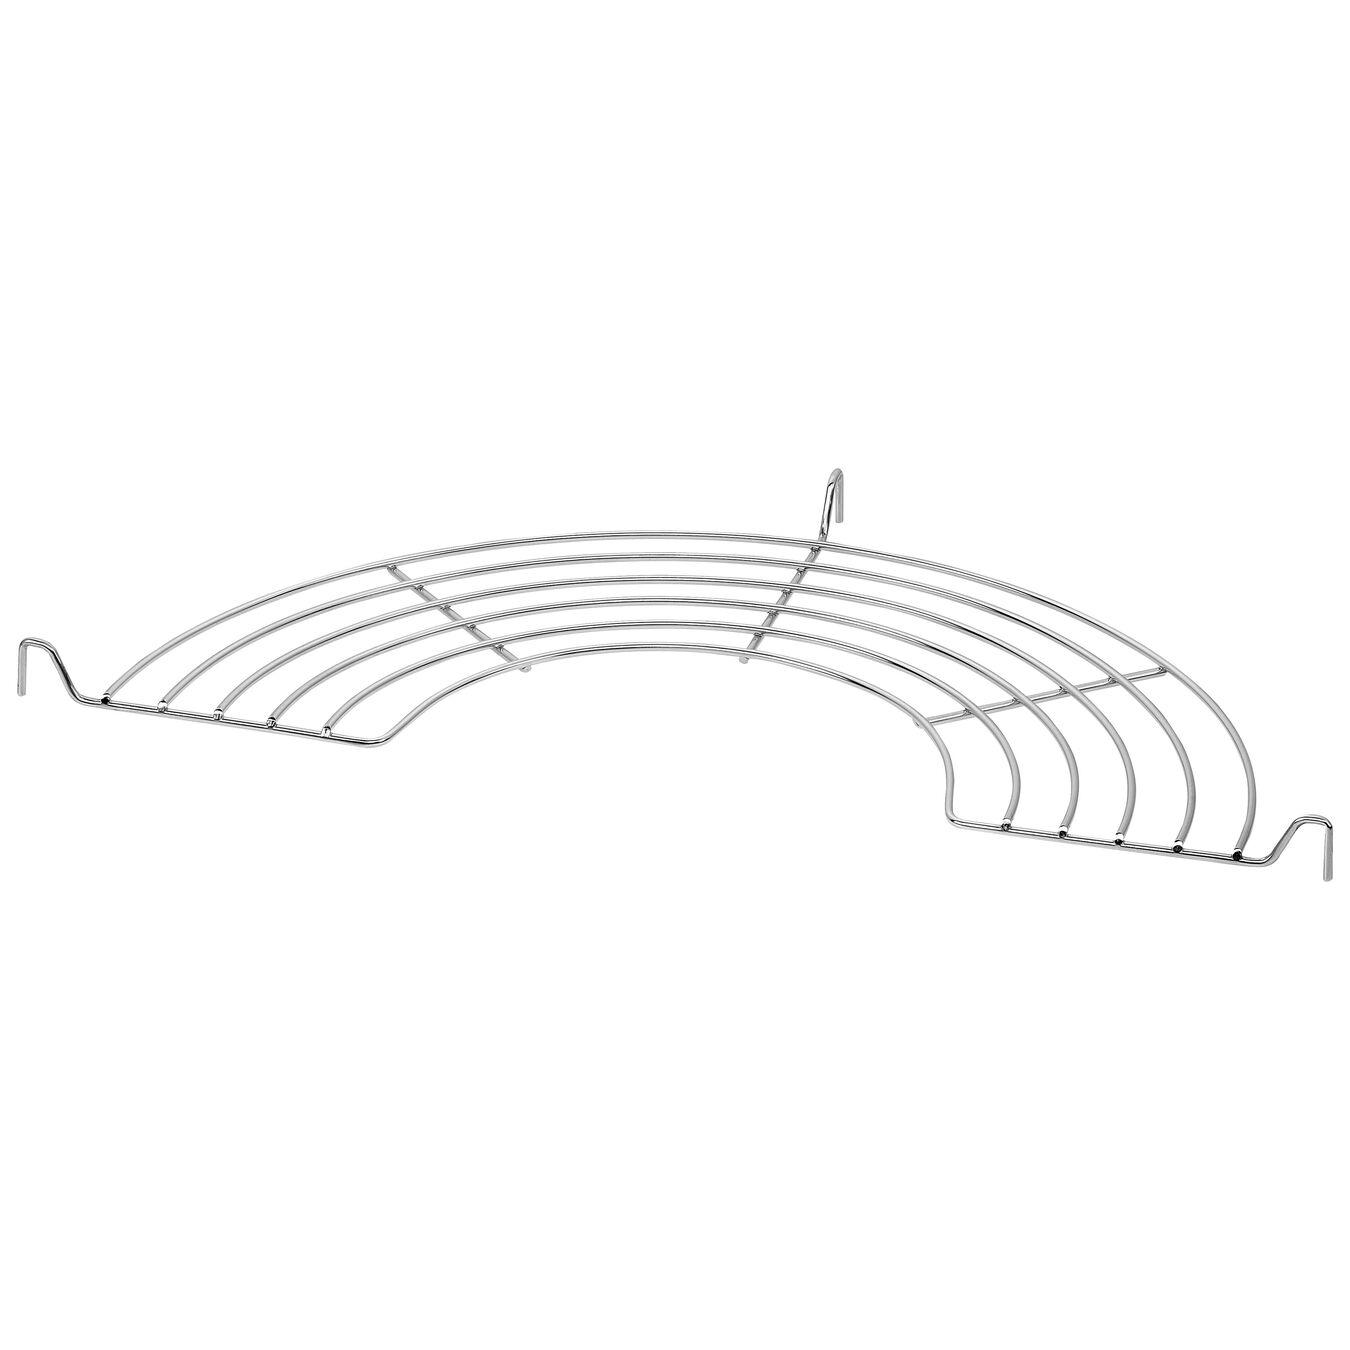 Wok 32 cm, 18/10 Edelstahl,,large 5